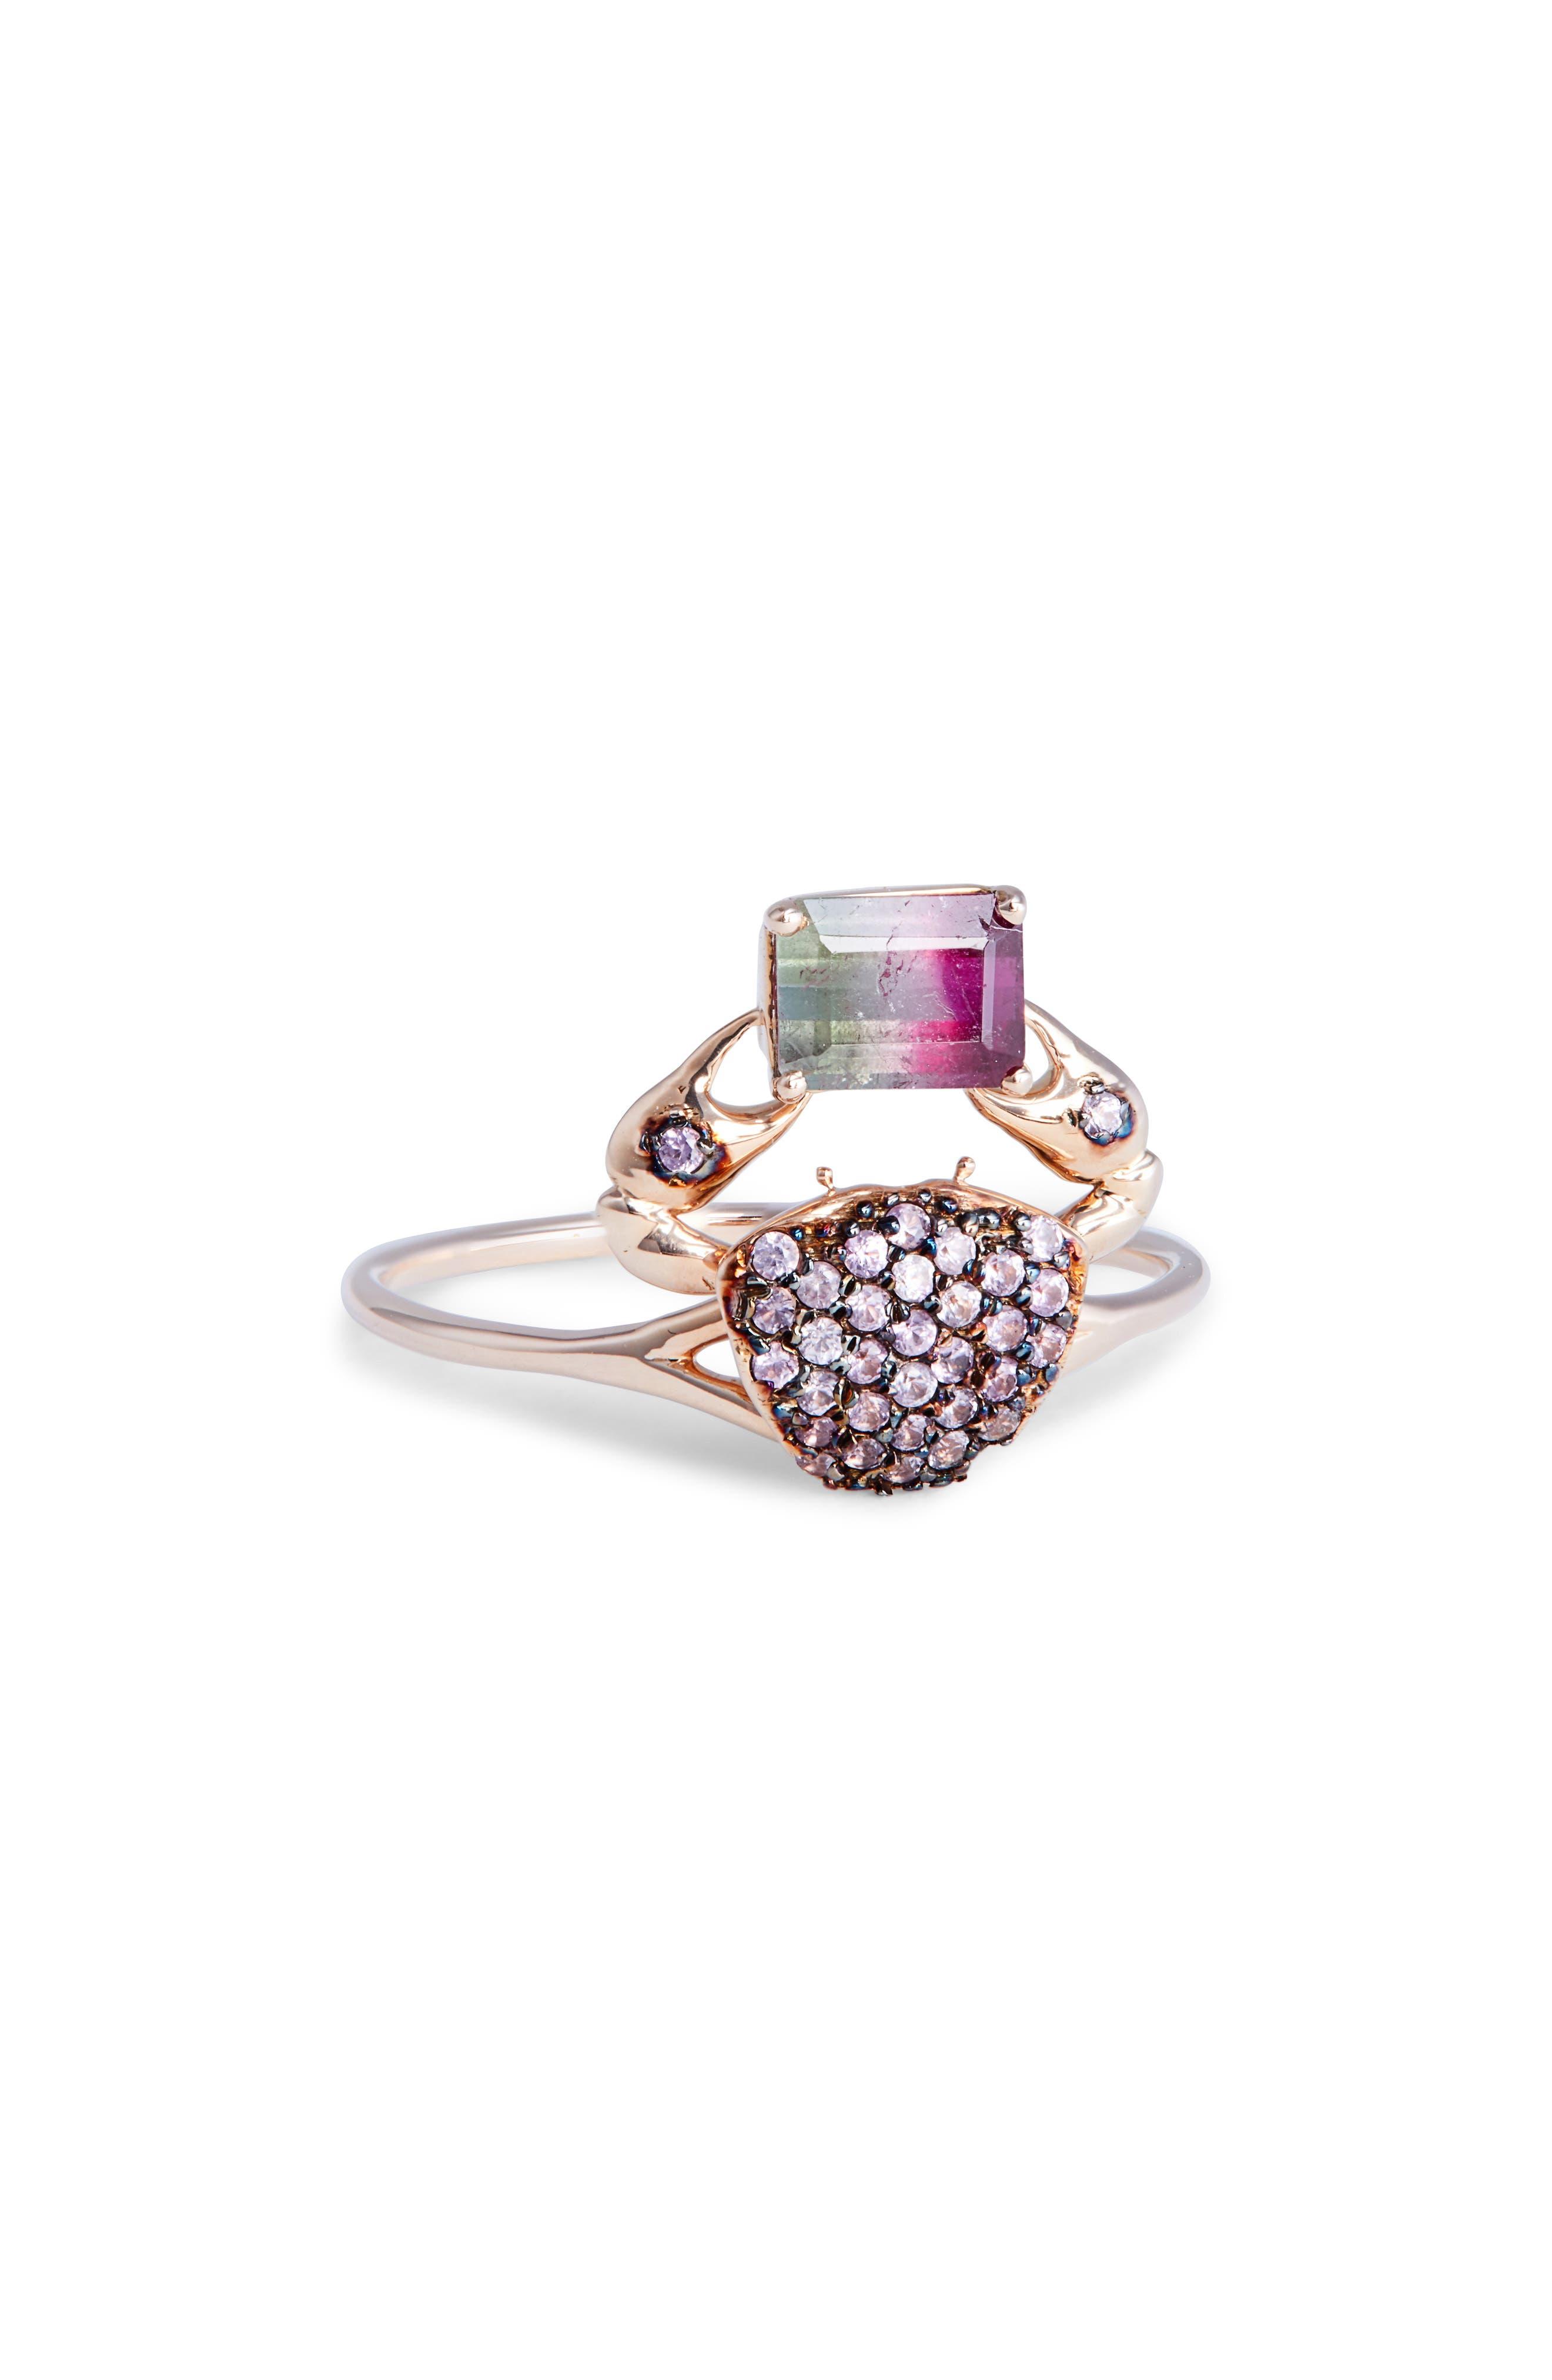 DANIELA VILLEGAS Cosquilleo Watermelon Tourmaline & Pink Sapphire Ring, Main, color, 710